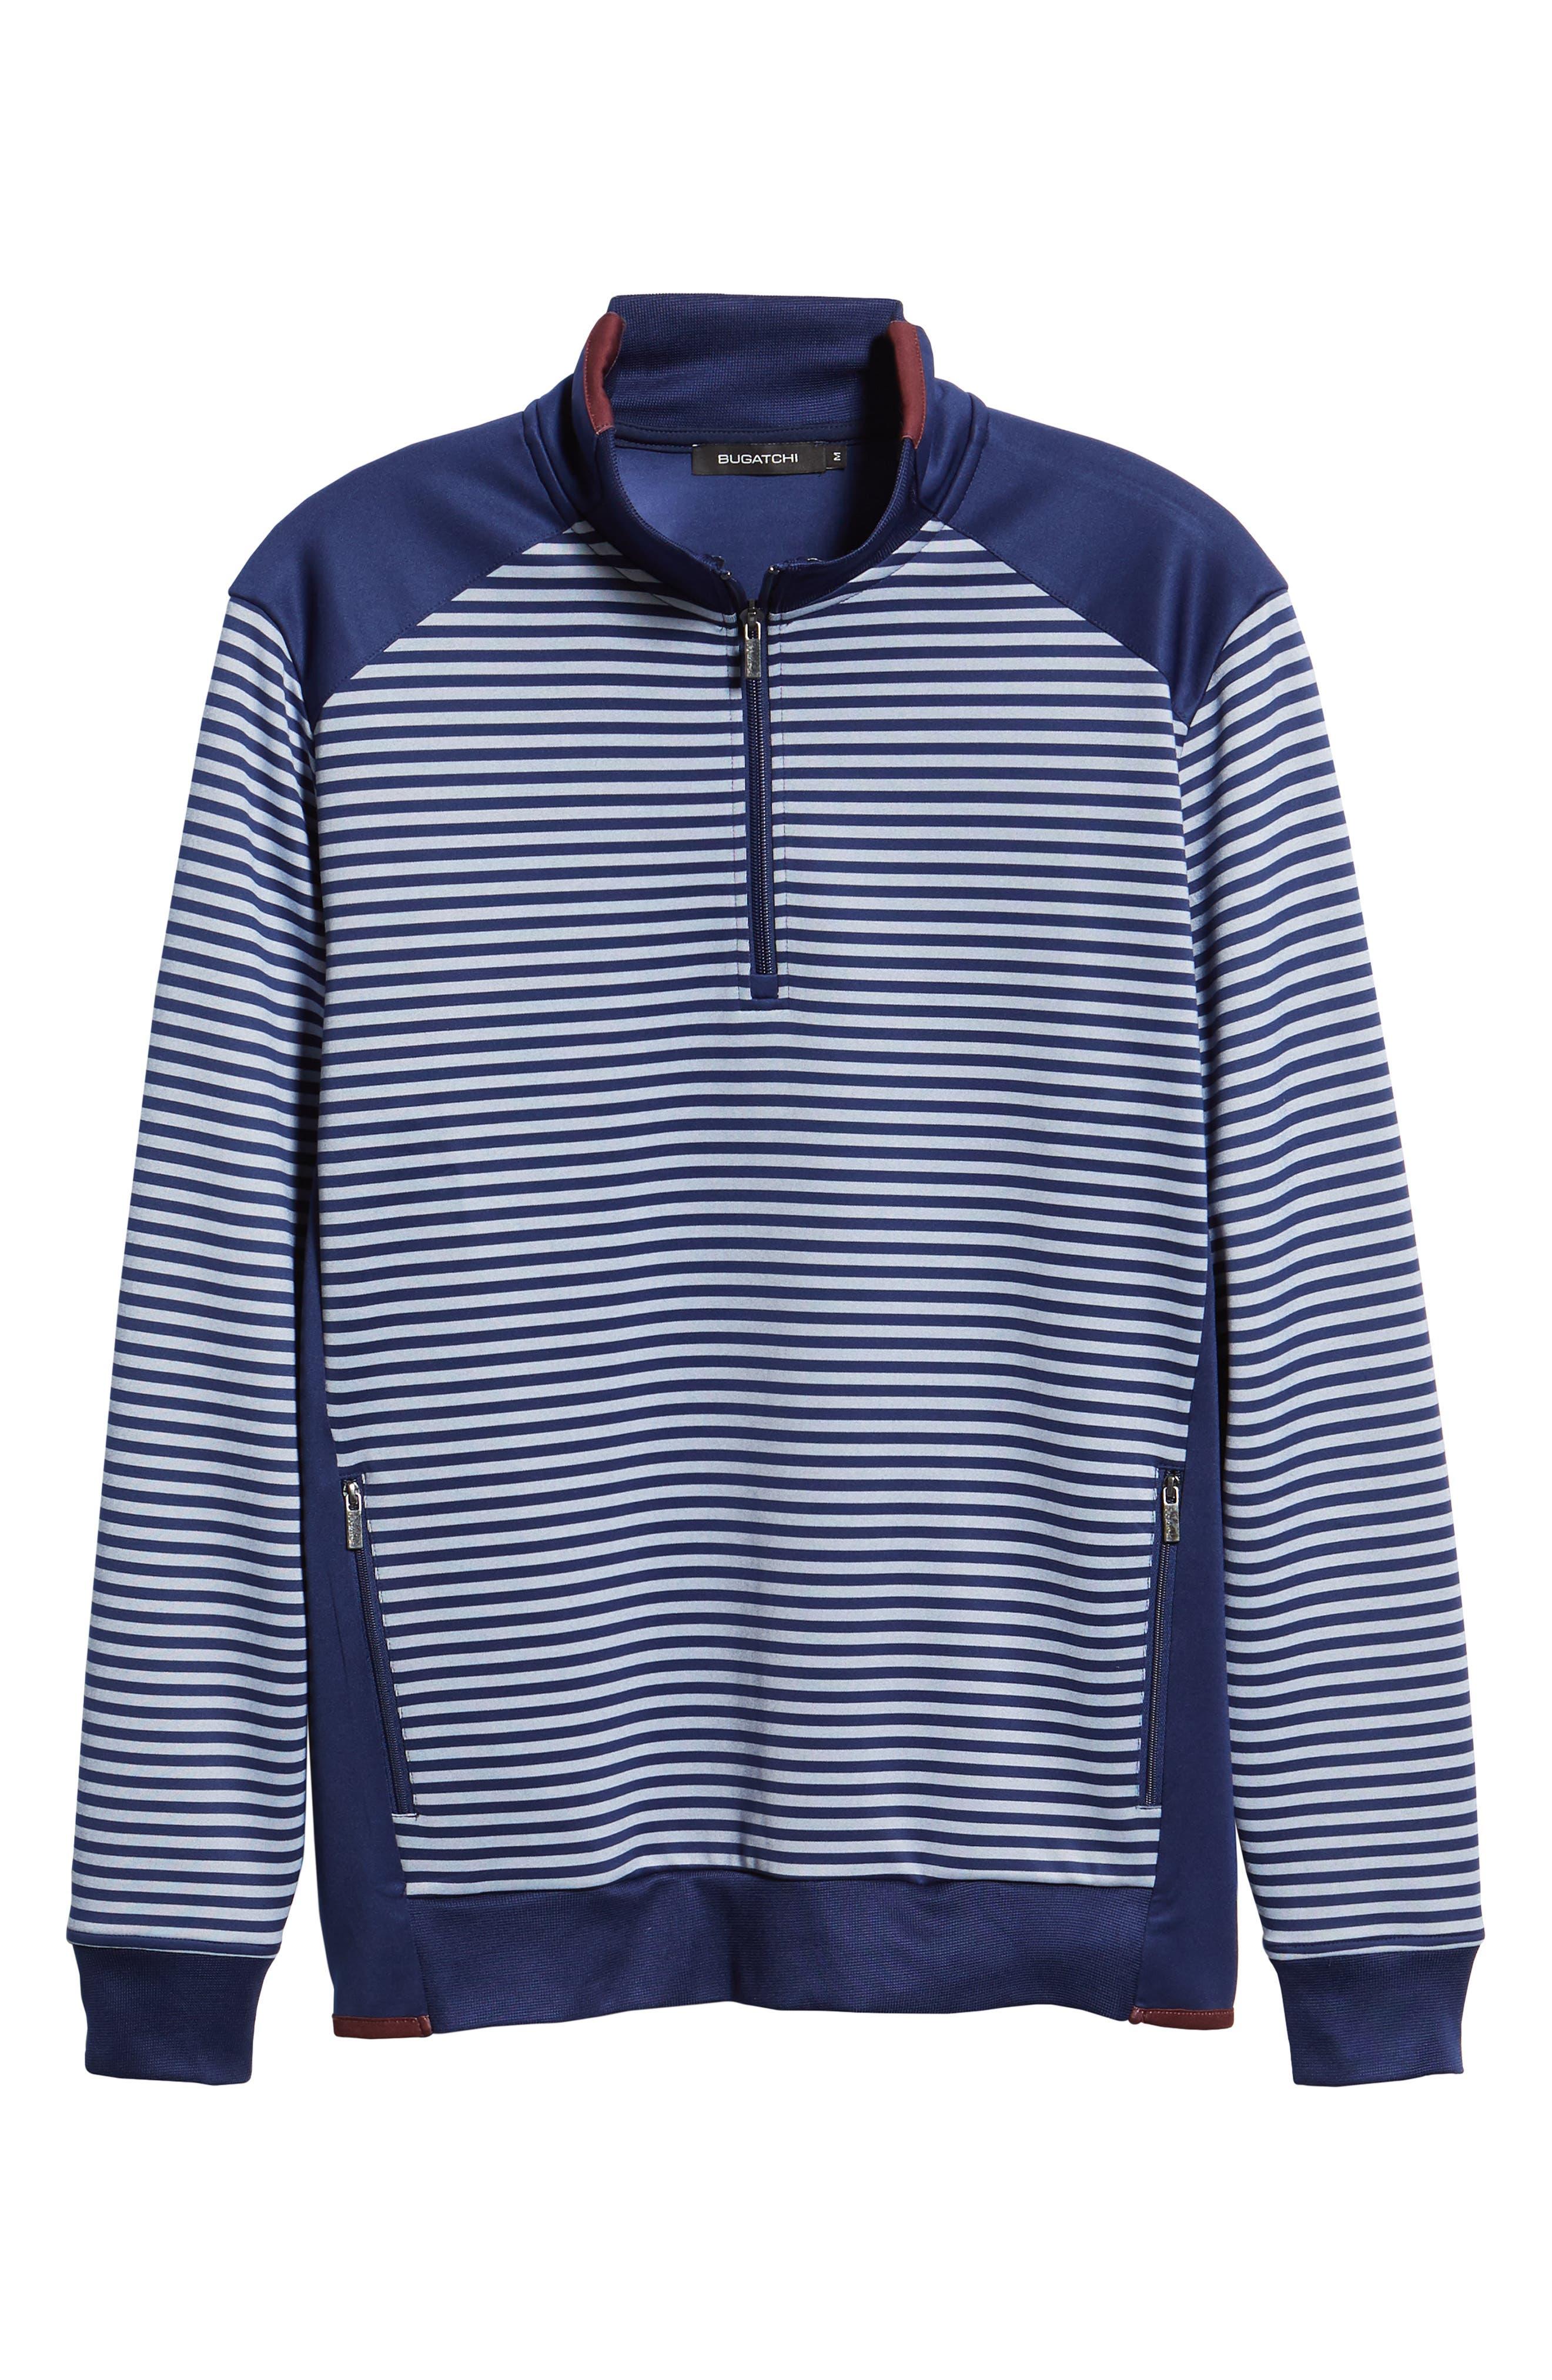 Regular Fit Stripe Quarter Zip Pullover,                             Alternate thumbnail 6, color,                             NAVY